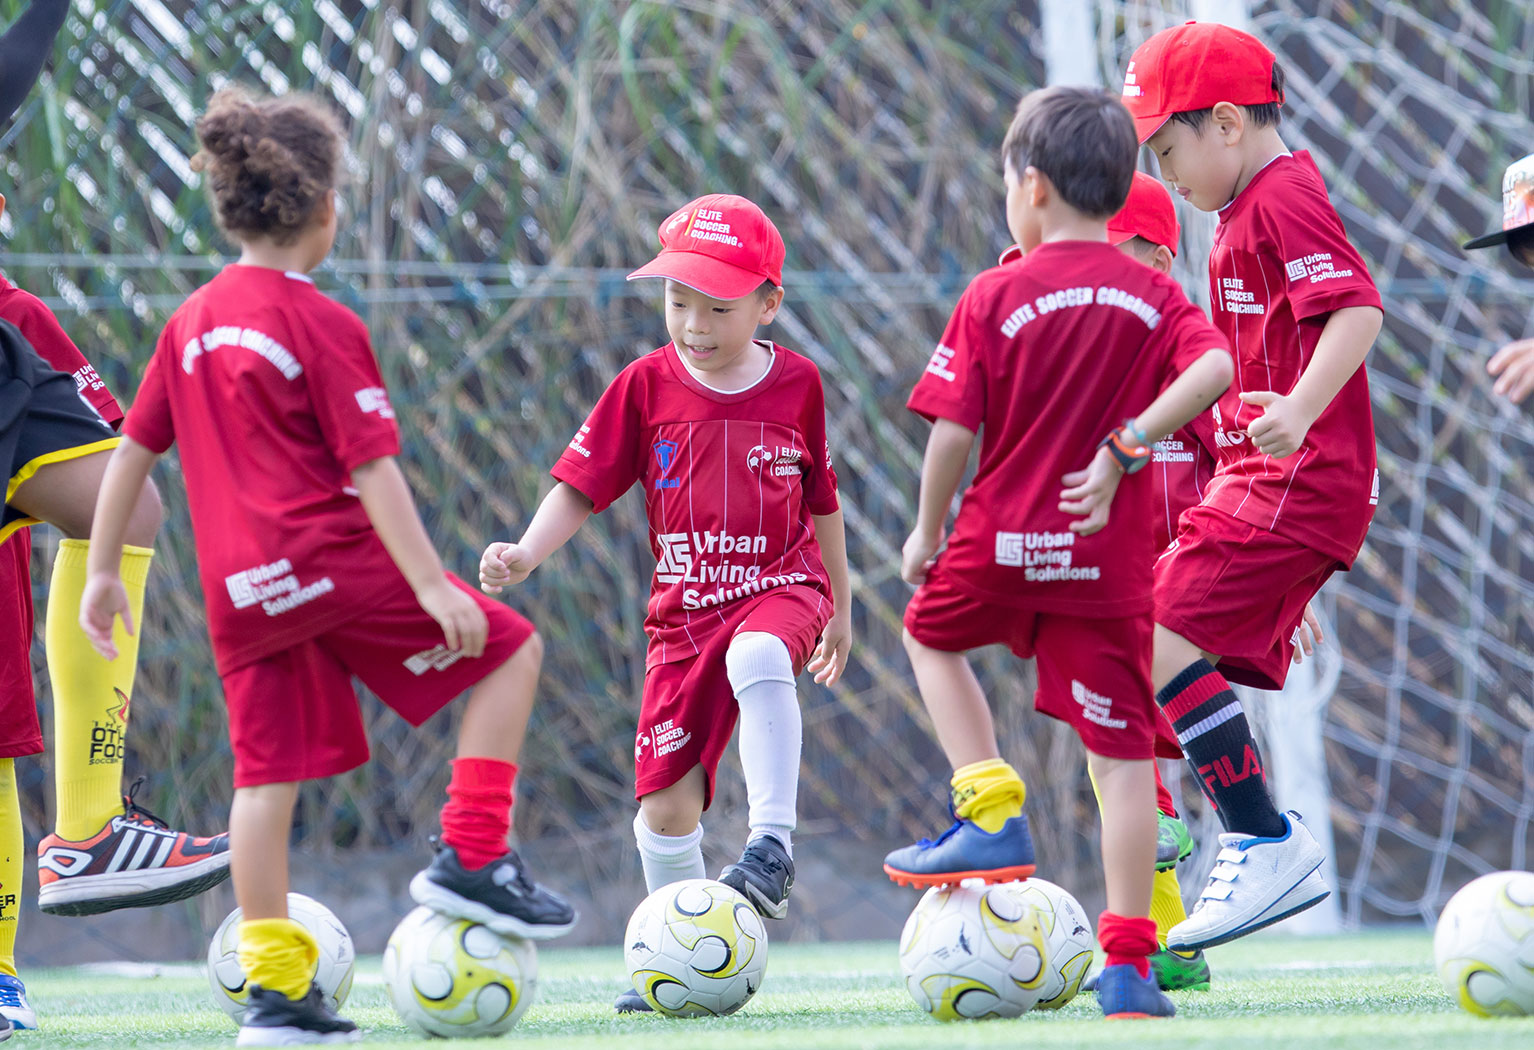 elite-soccer-coaching-football-school-cambodia-5-8